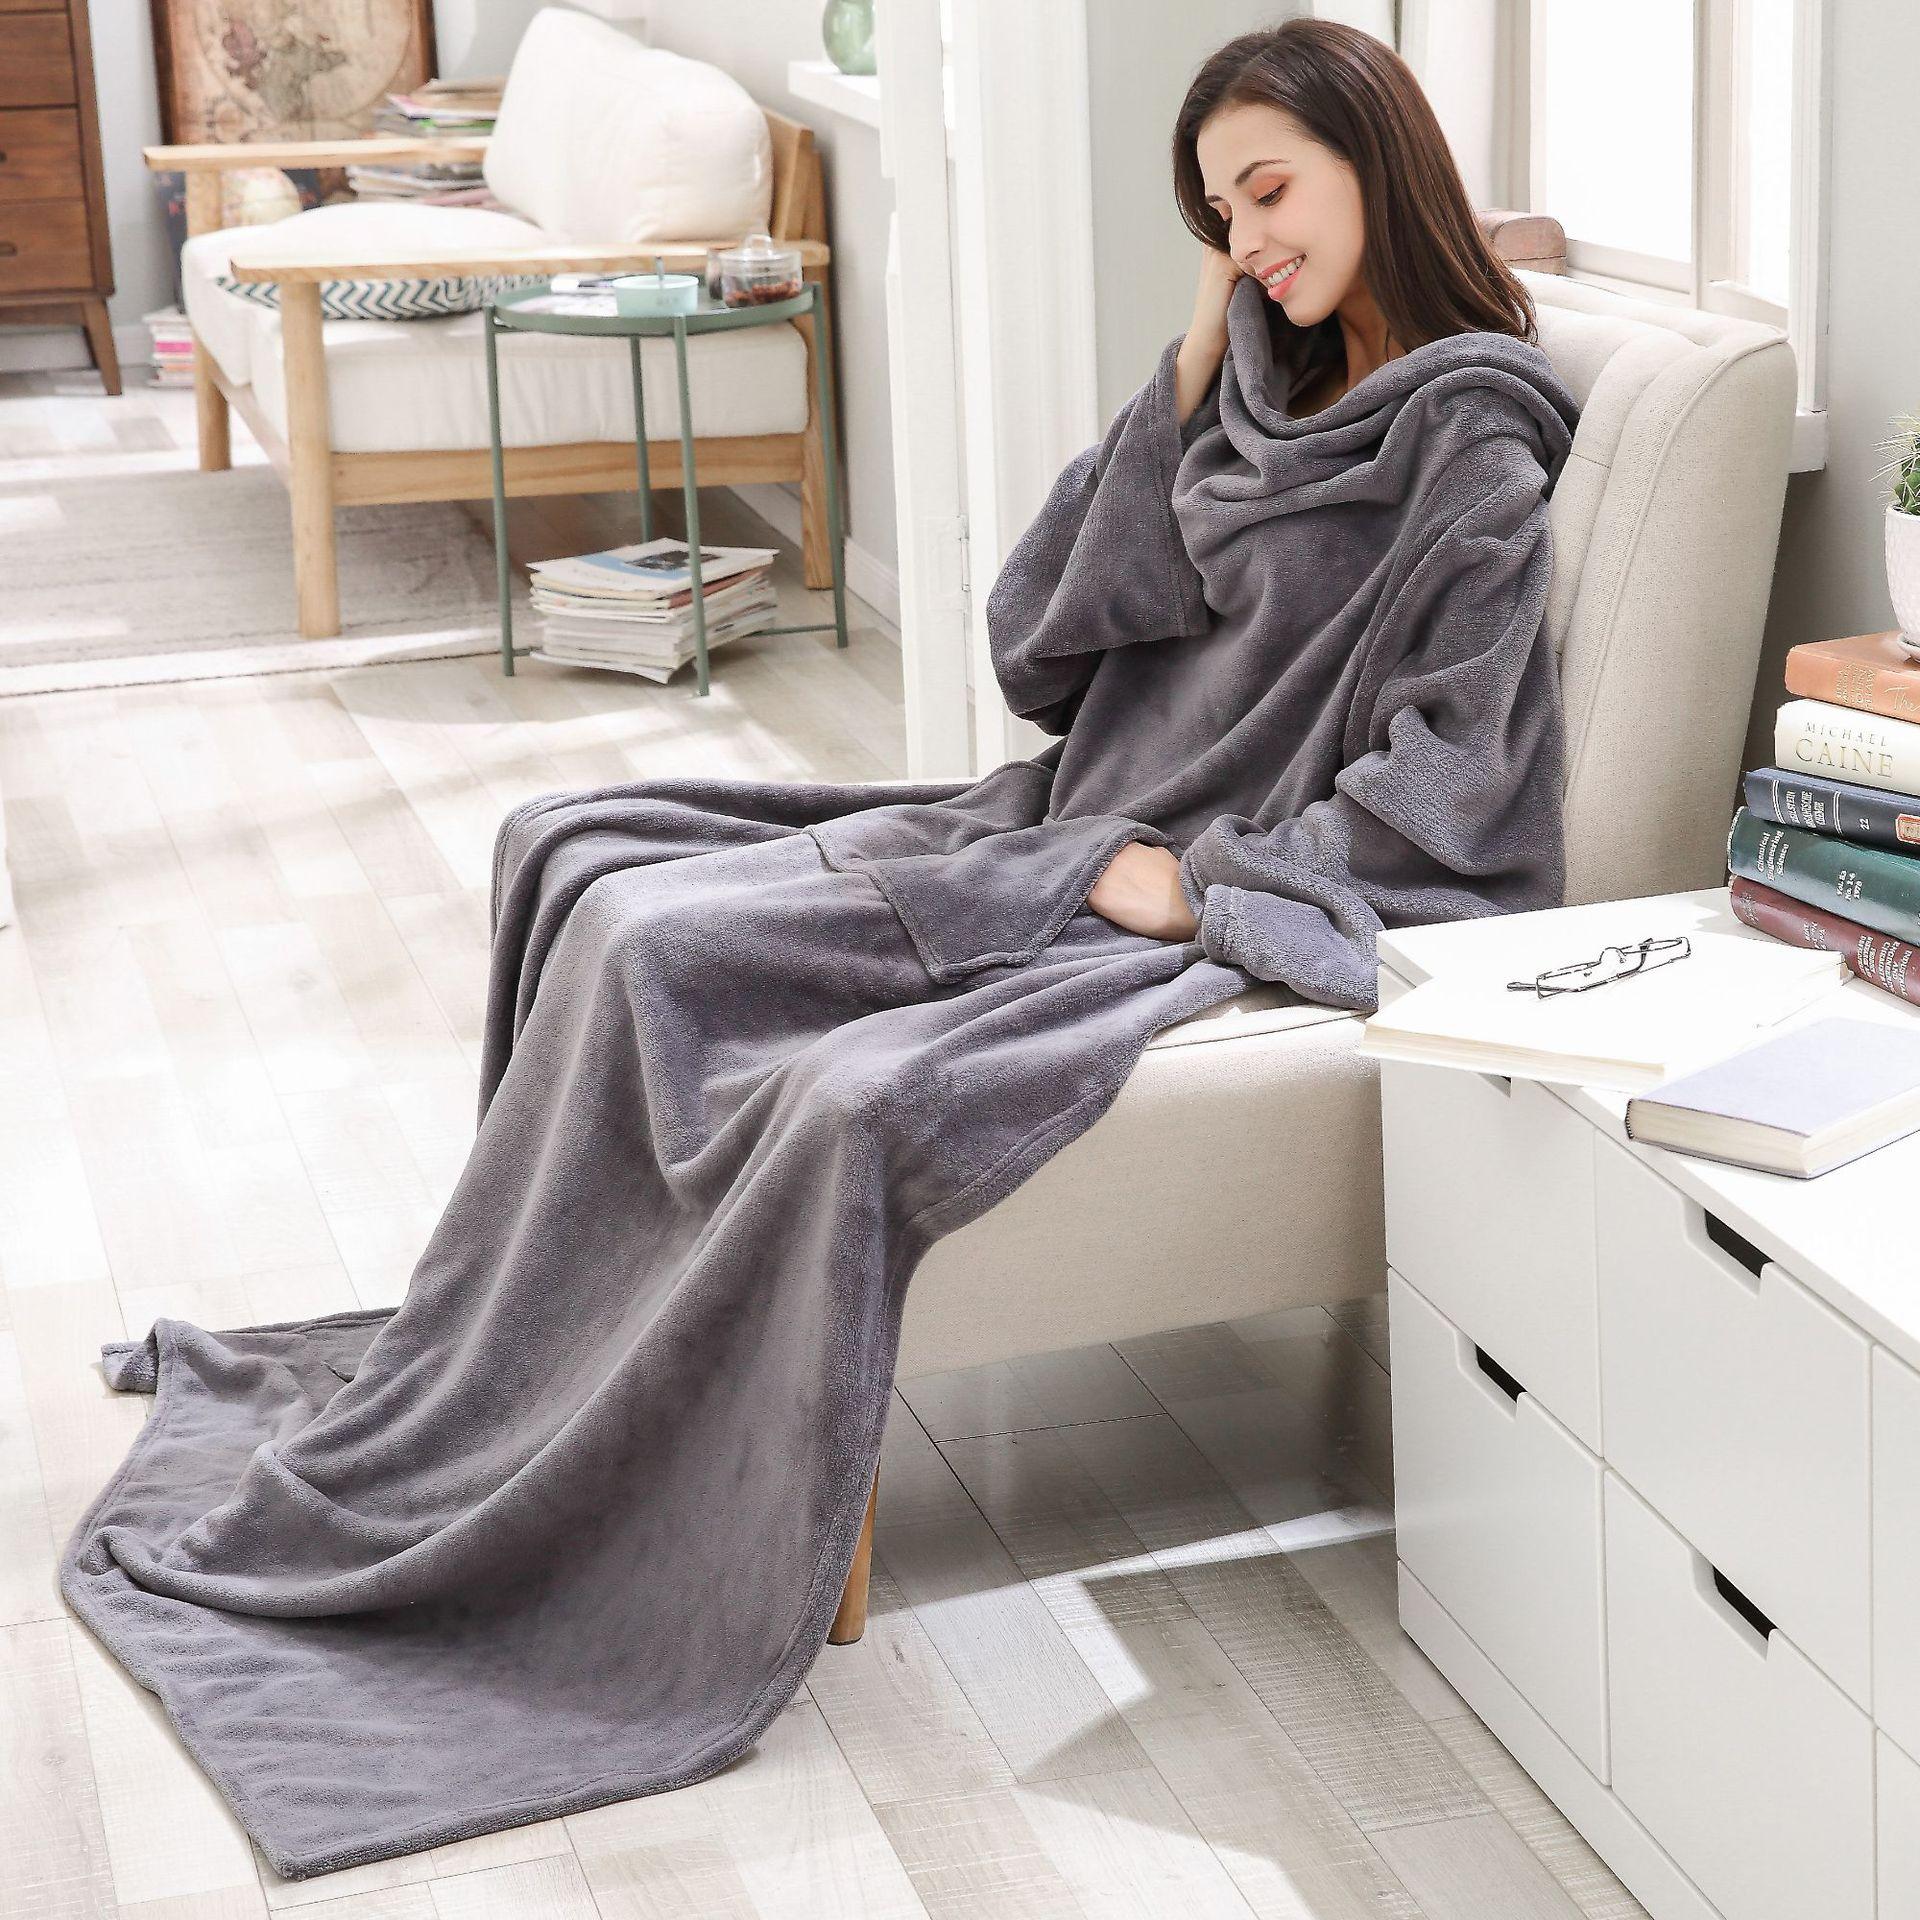 Cobertor longo quente super macio do velo com luvas casa velo coral cobertor de bolso adulto inverno lavagem flanela robe pele-friendly